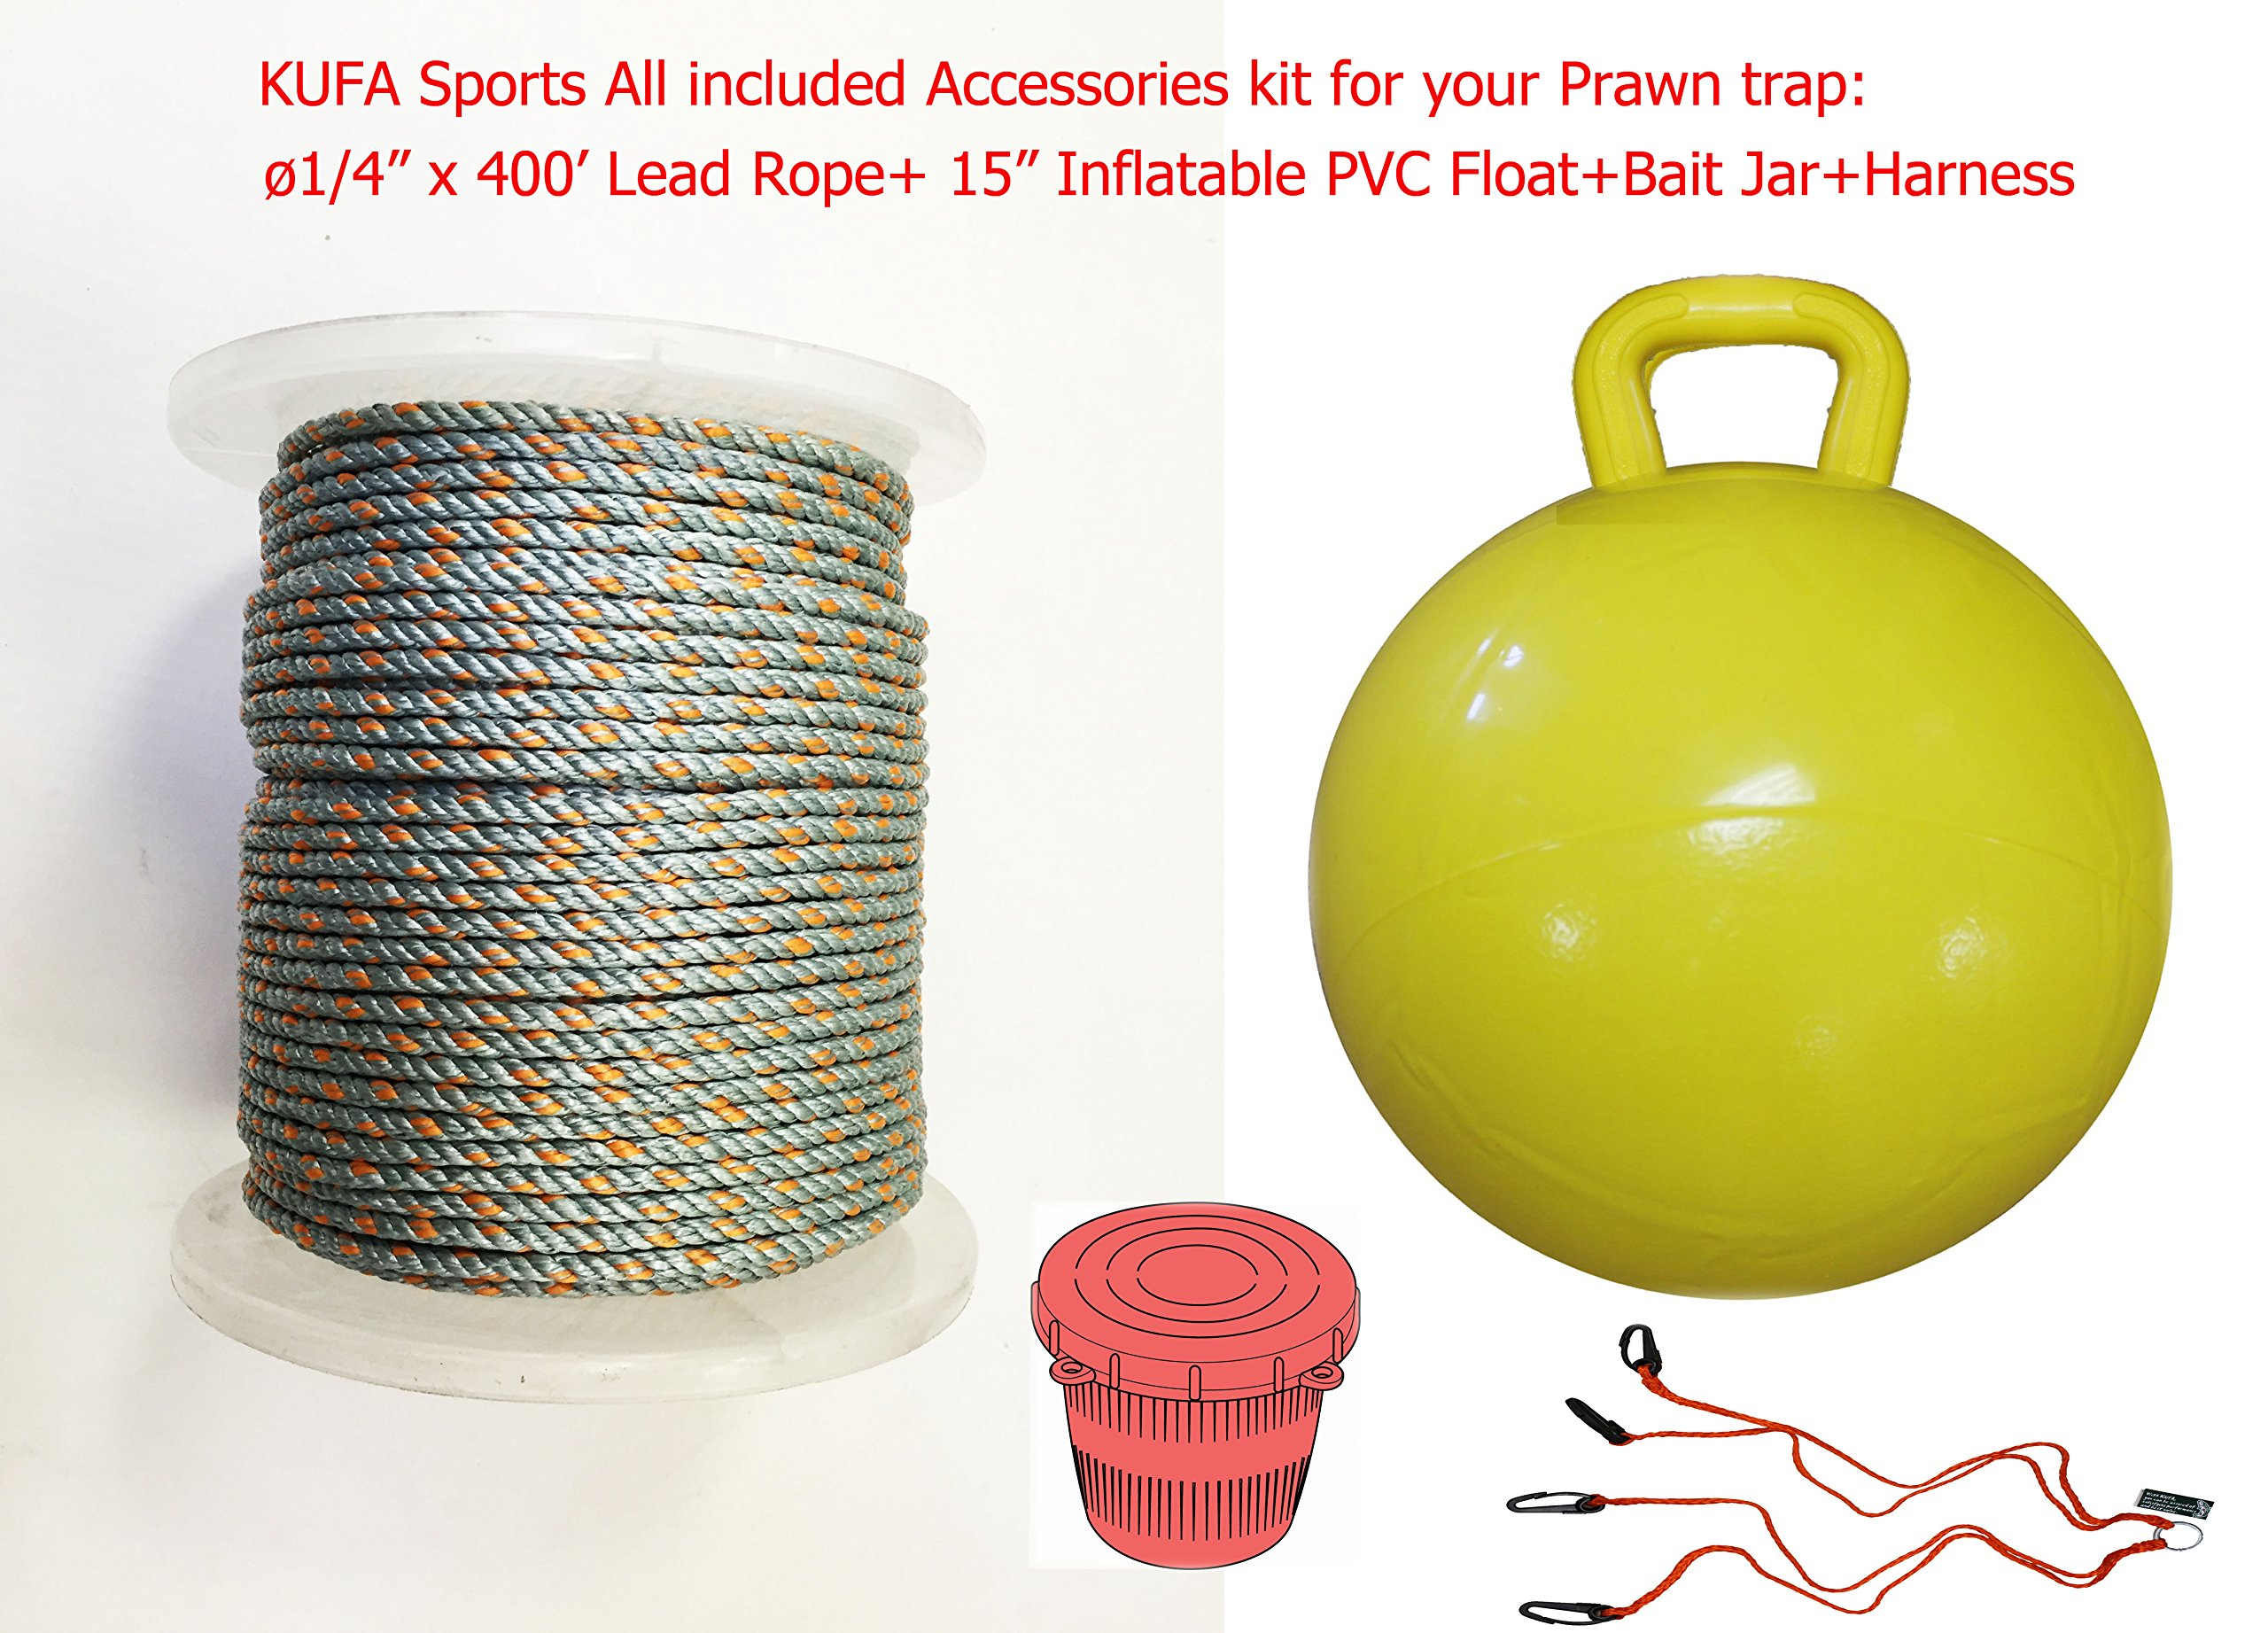 KUFA Sports All Included Prawn Trap Accessories/(1/4'' x 400'' Lead Core Rope)/15'' Float/Bait Jar/Harness Combo by KUFA Sports